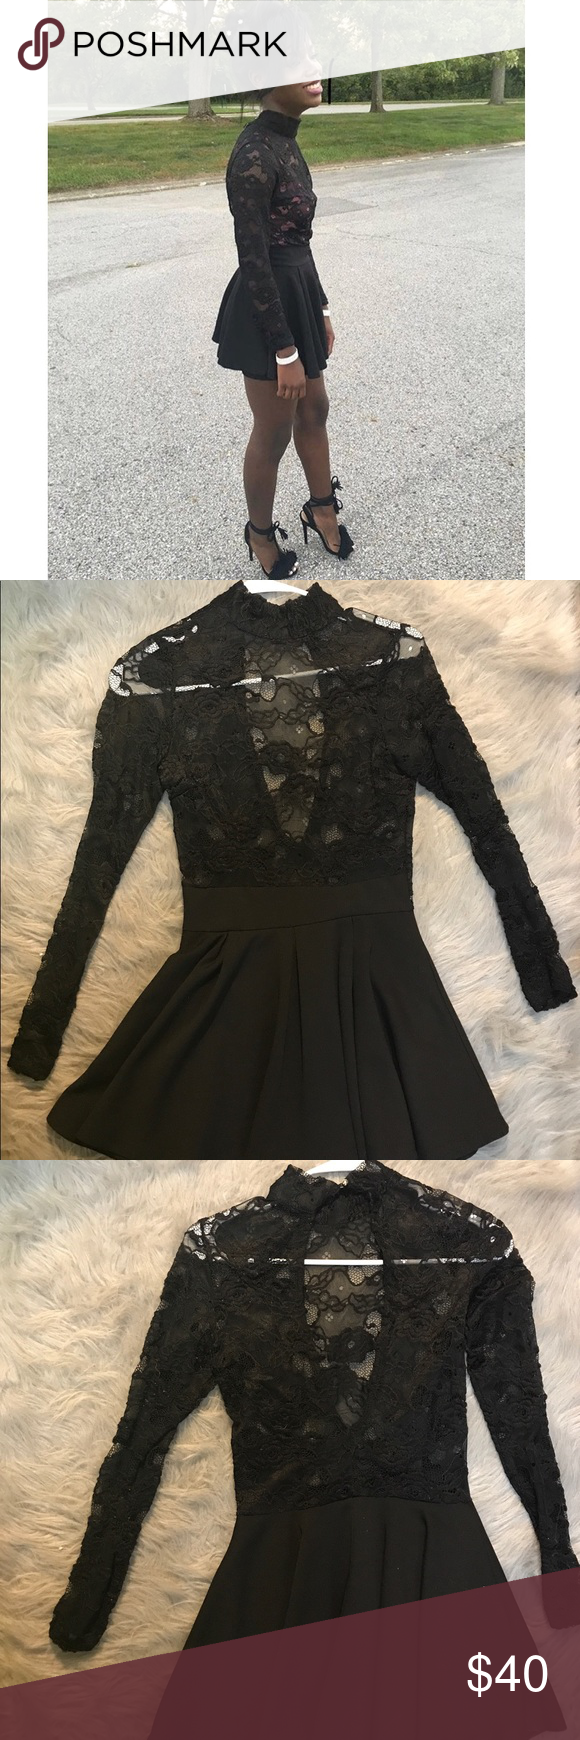 Windsor mini dress long sleeve black windsors minidress with shorts